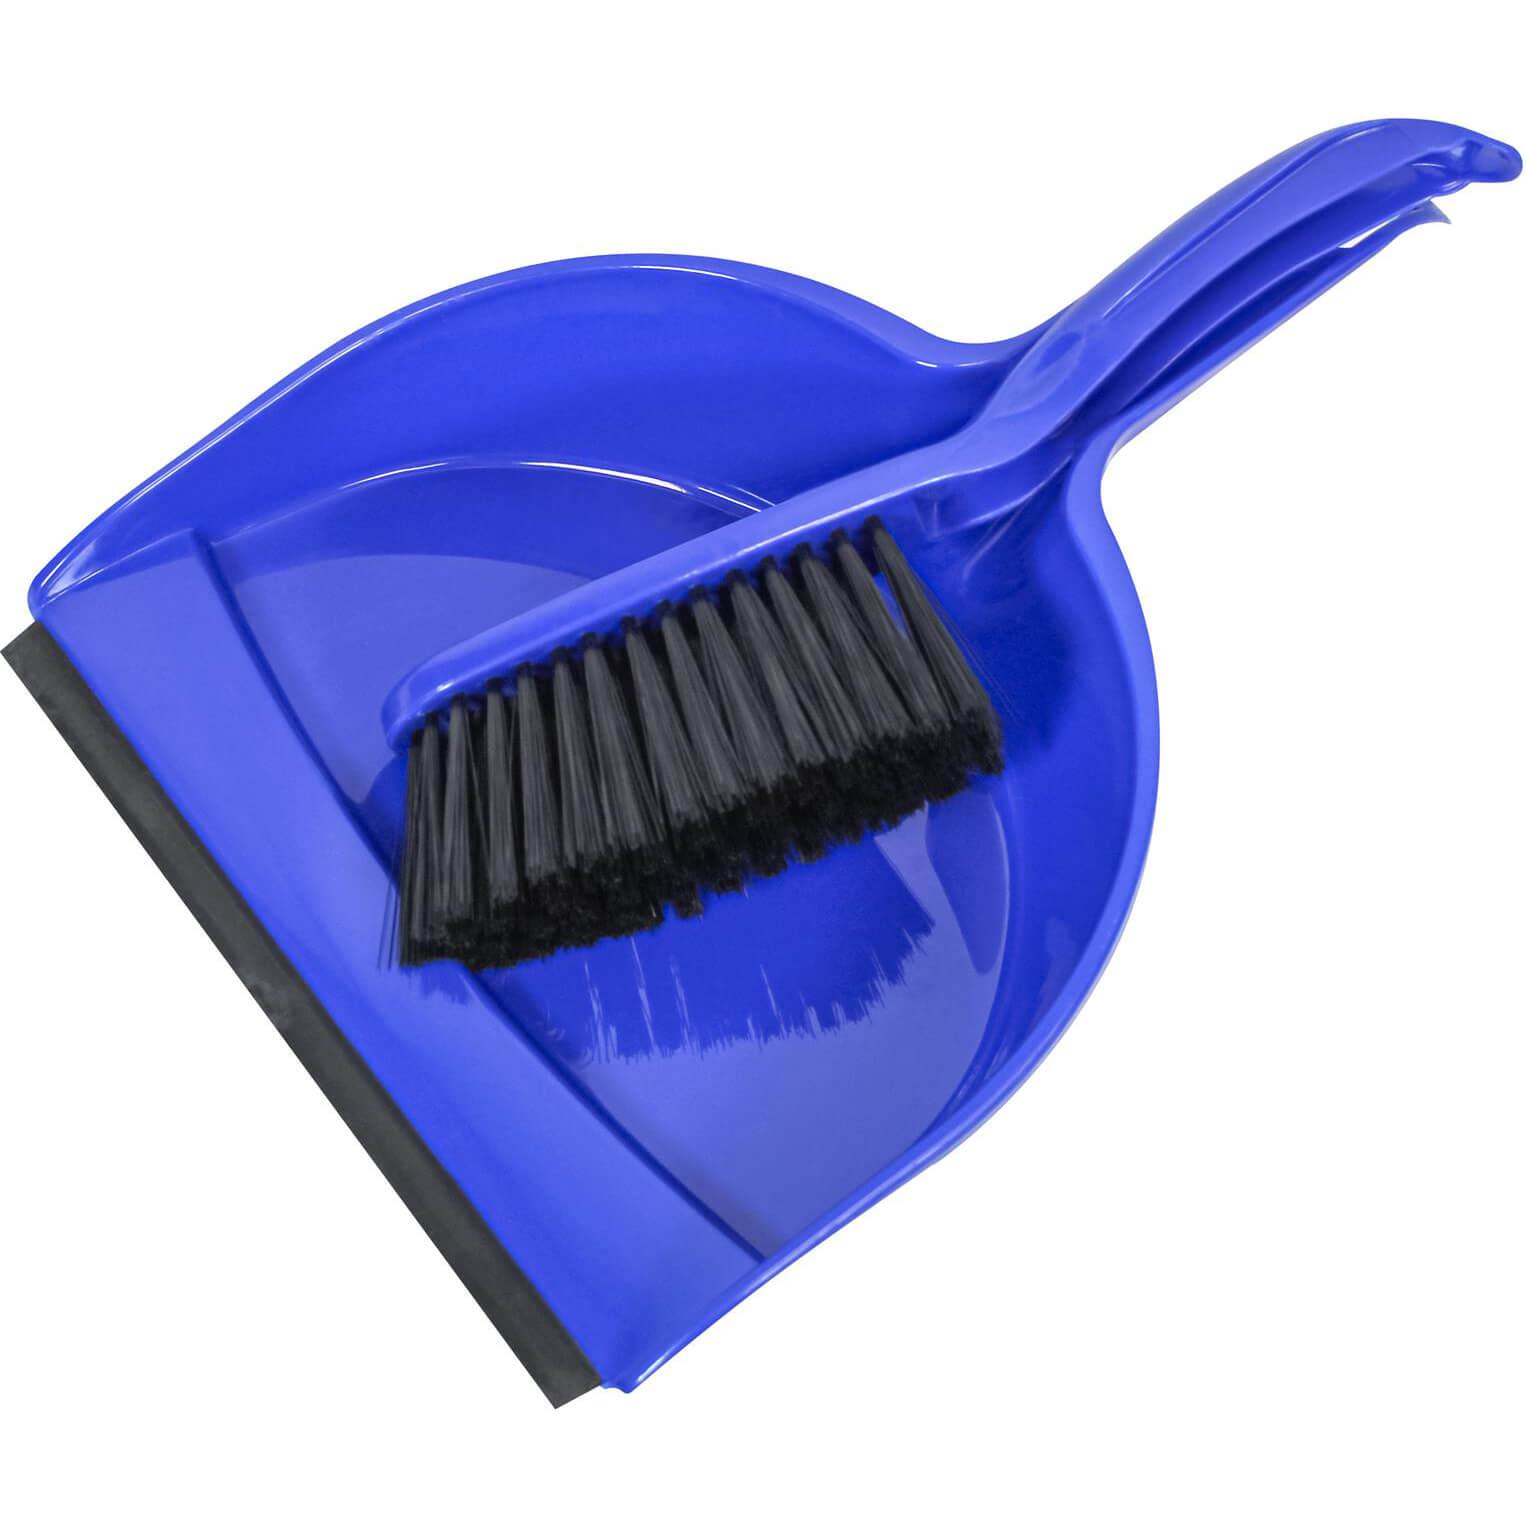 Image of Faithfull Plastic Dustpan & Brush Set